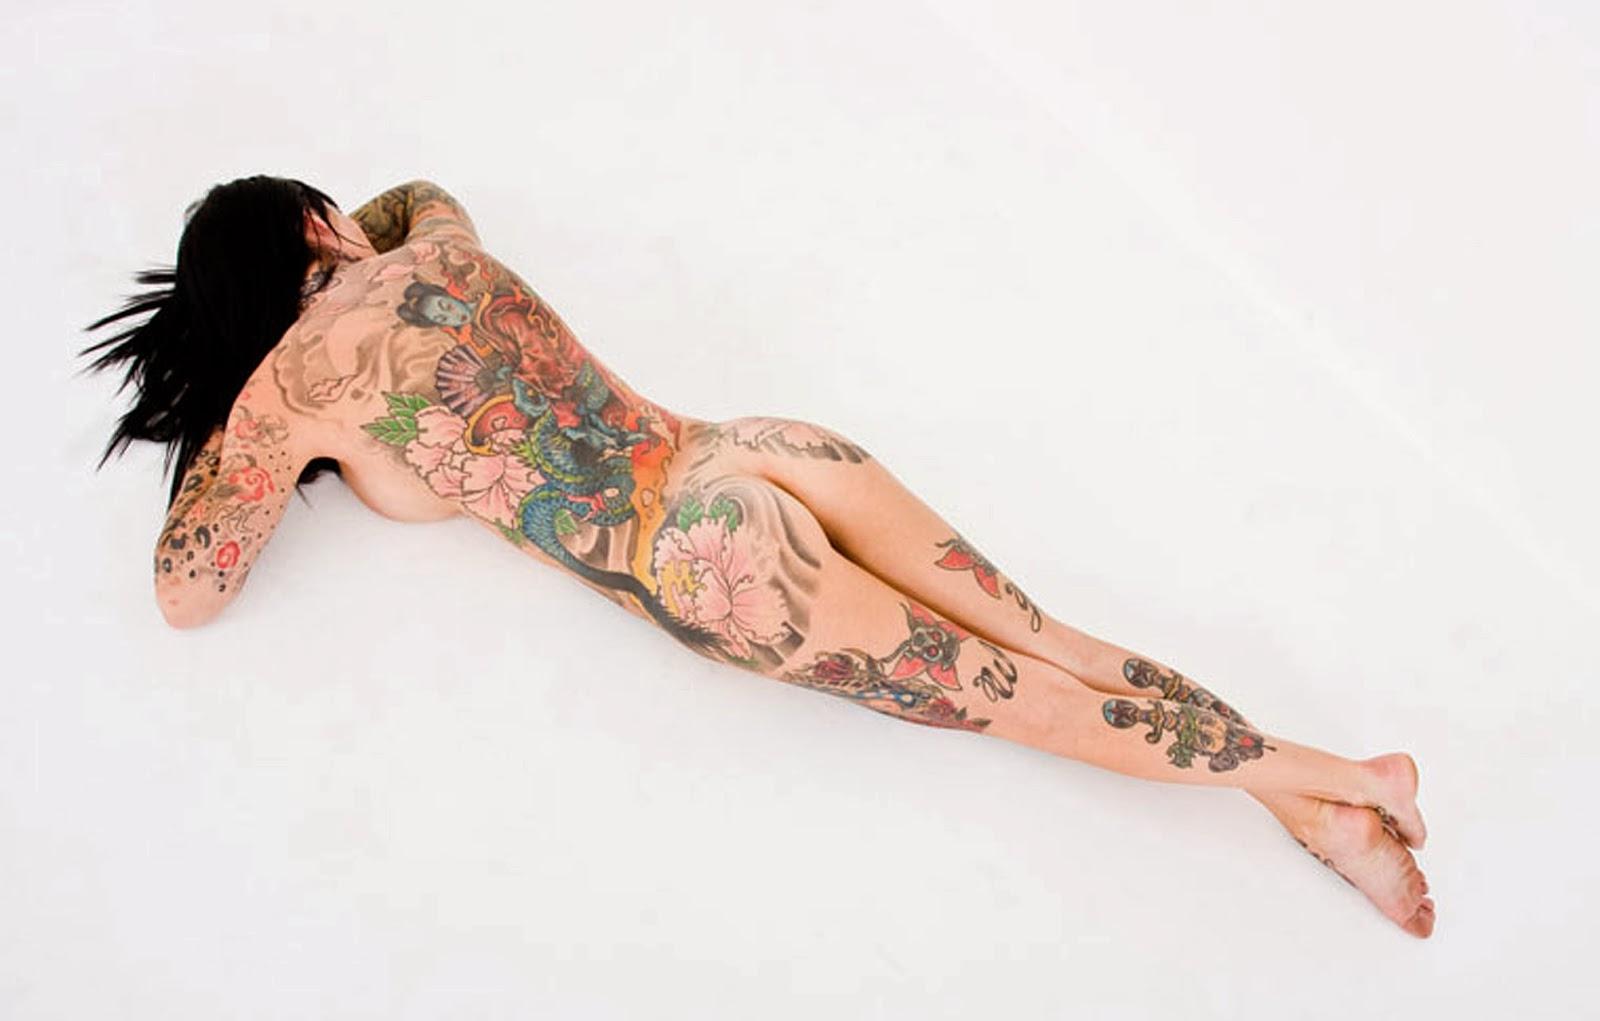 Tatuajes Anime top 10 tatuajes anime : otakunonika • articulos  reseñas, actualidad